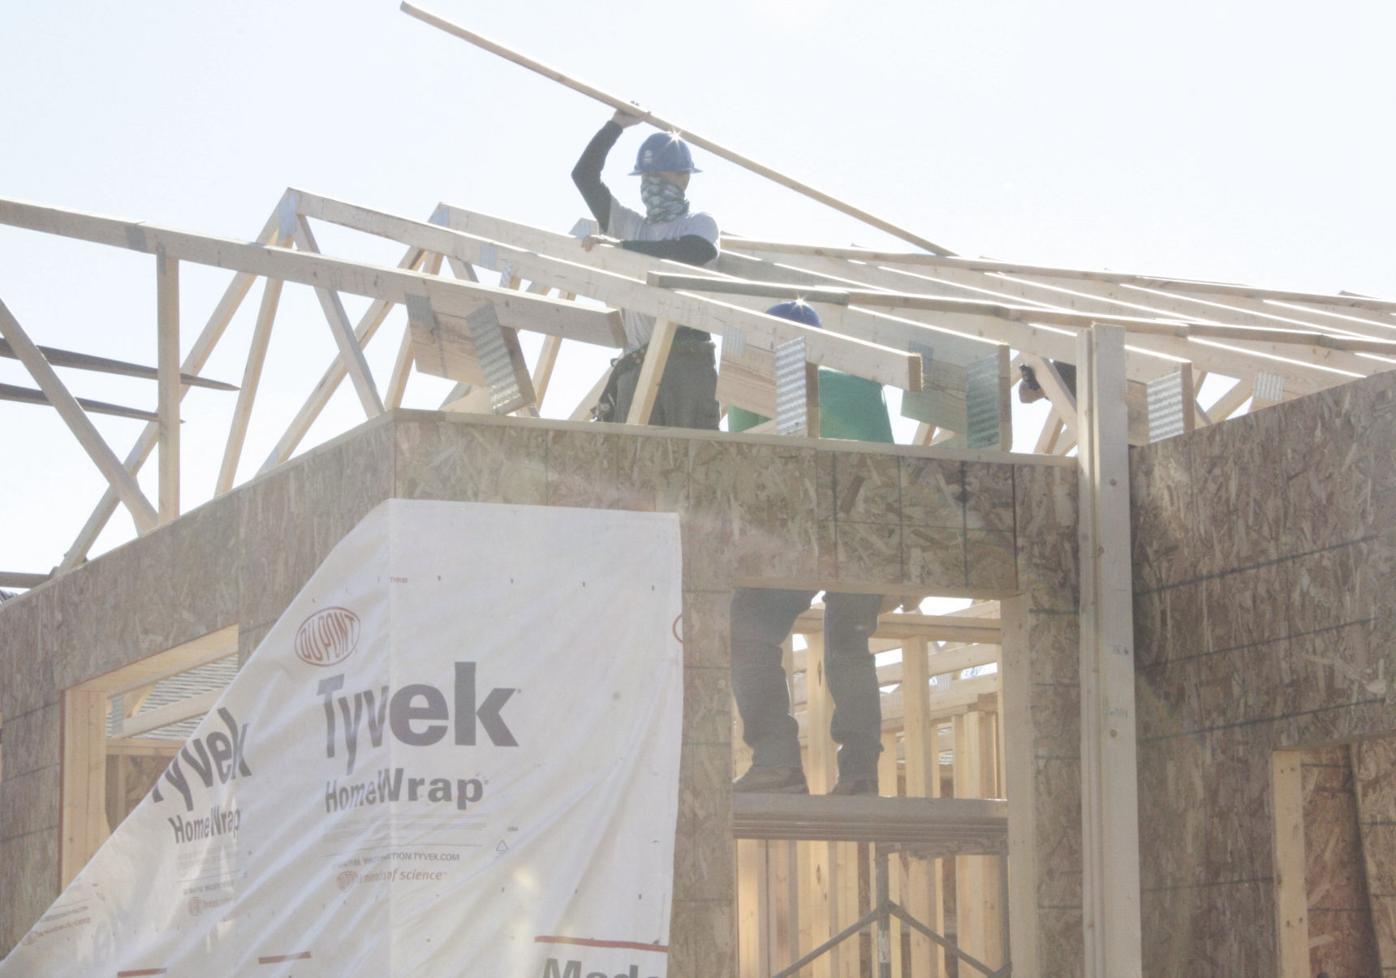 Habitat keeps building